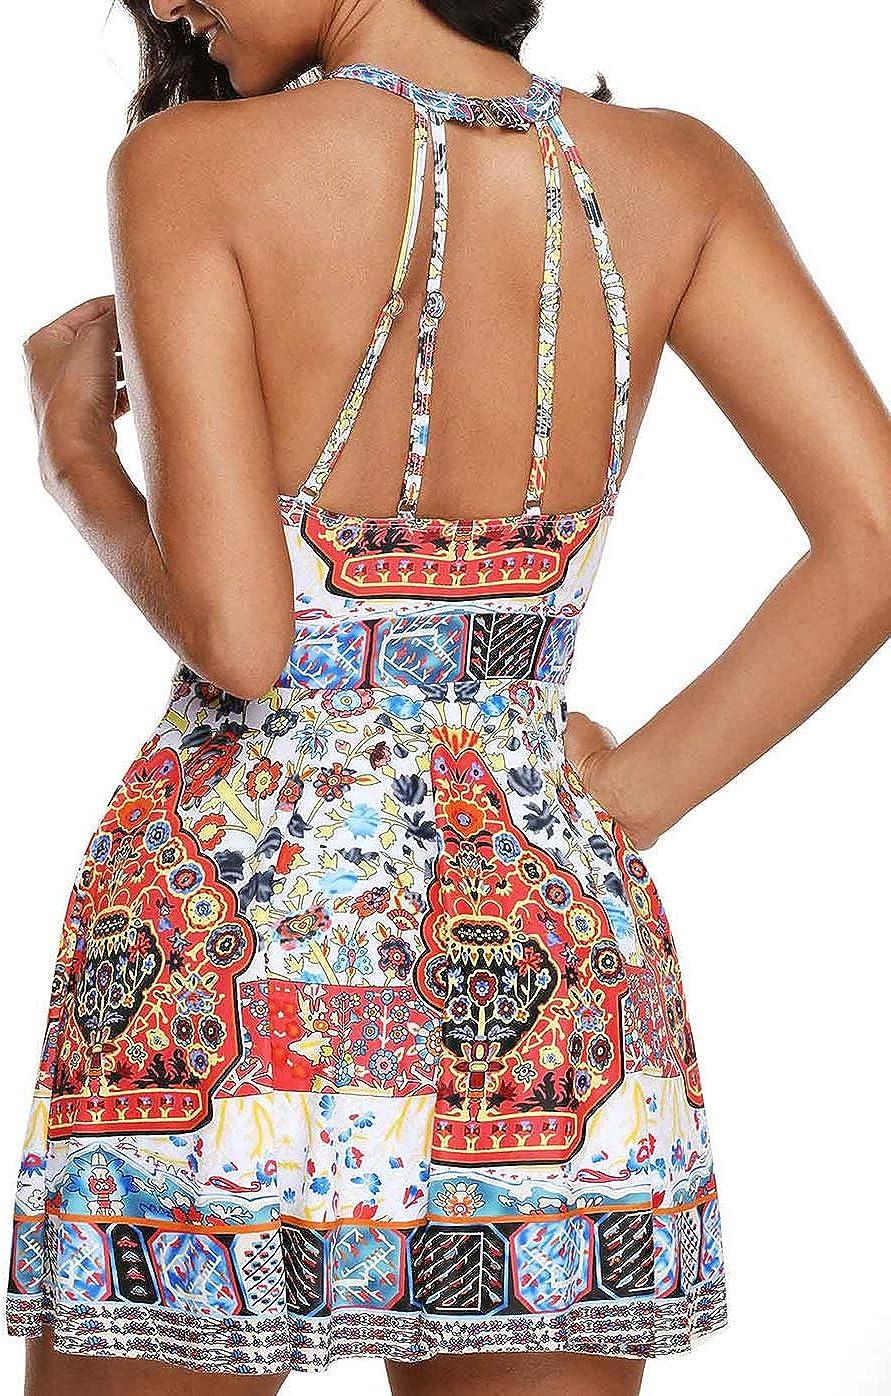 Damen Vintage Blumen Badekleid Tankini Plus Gr/ö/ße One Pieces Bademode Strandkleidung